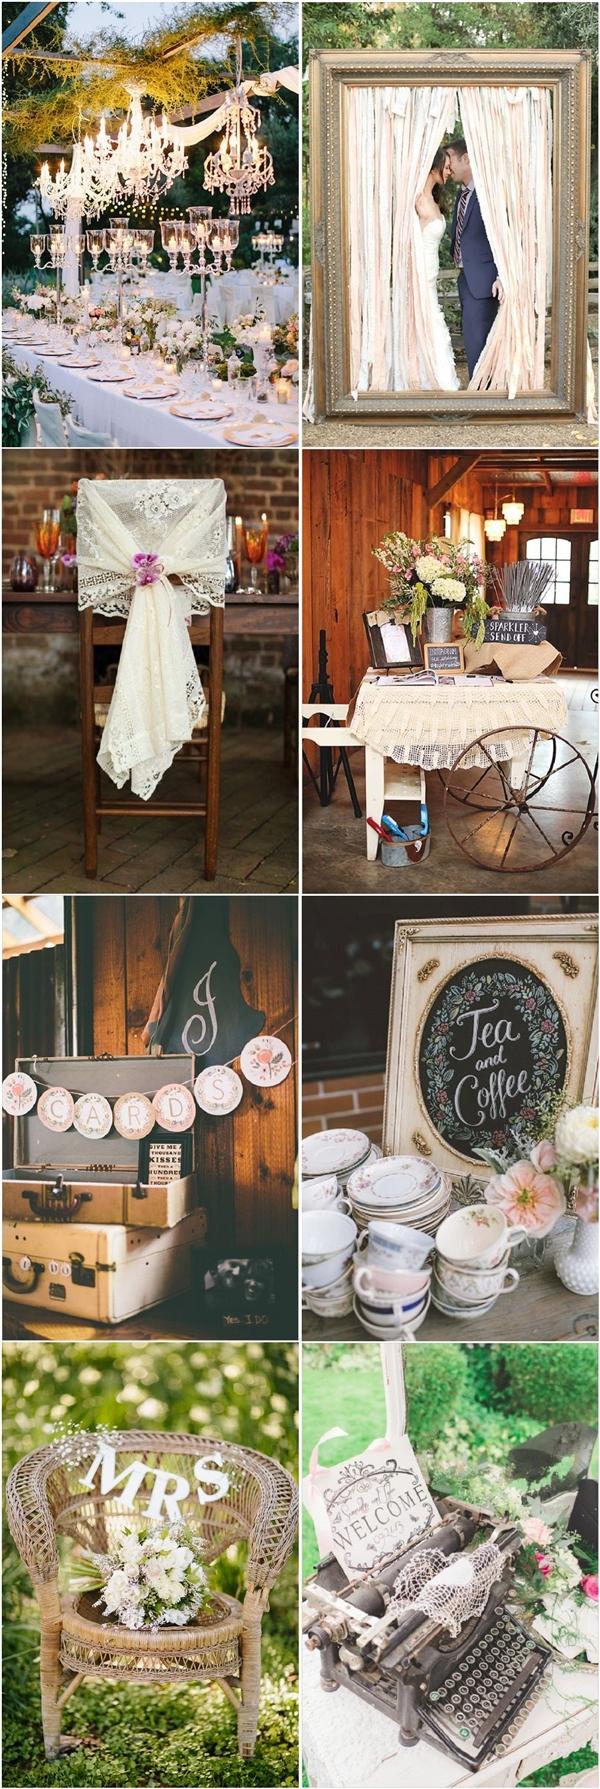 vintage wedding ideas for spring summer weddings vintage wedding ideas chic vintage wedding decor ideas